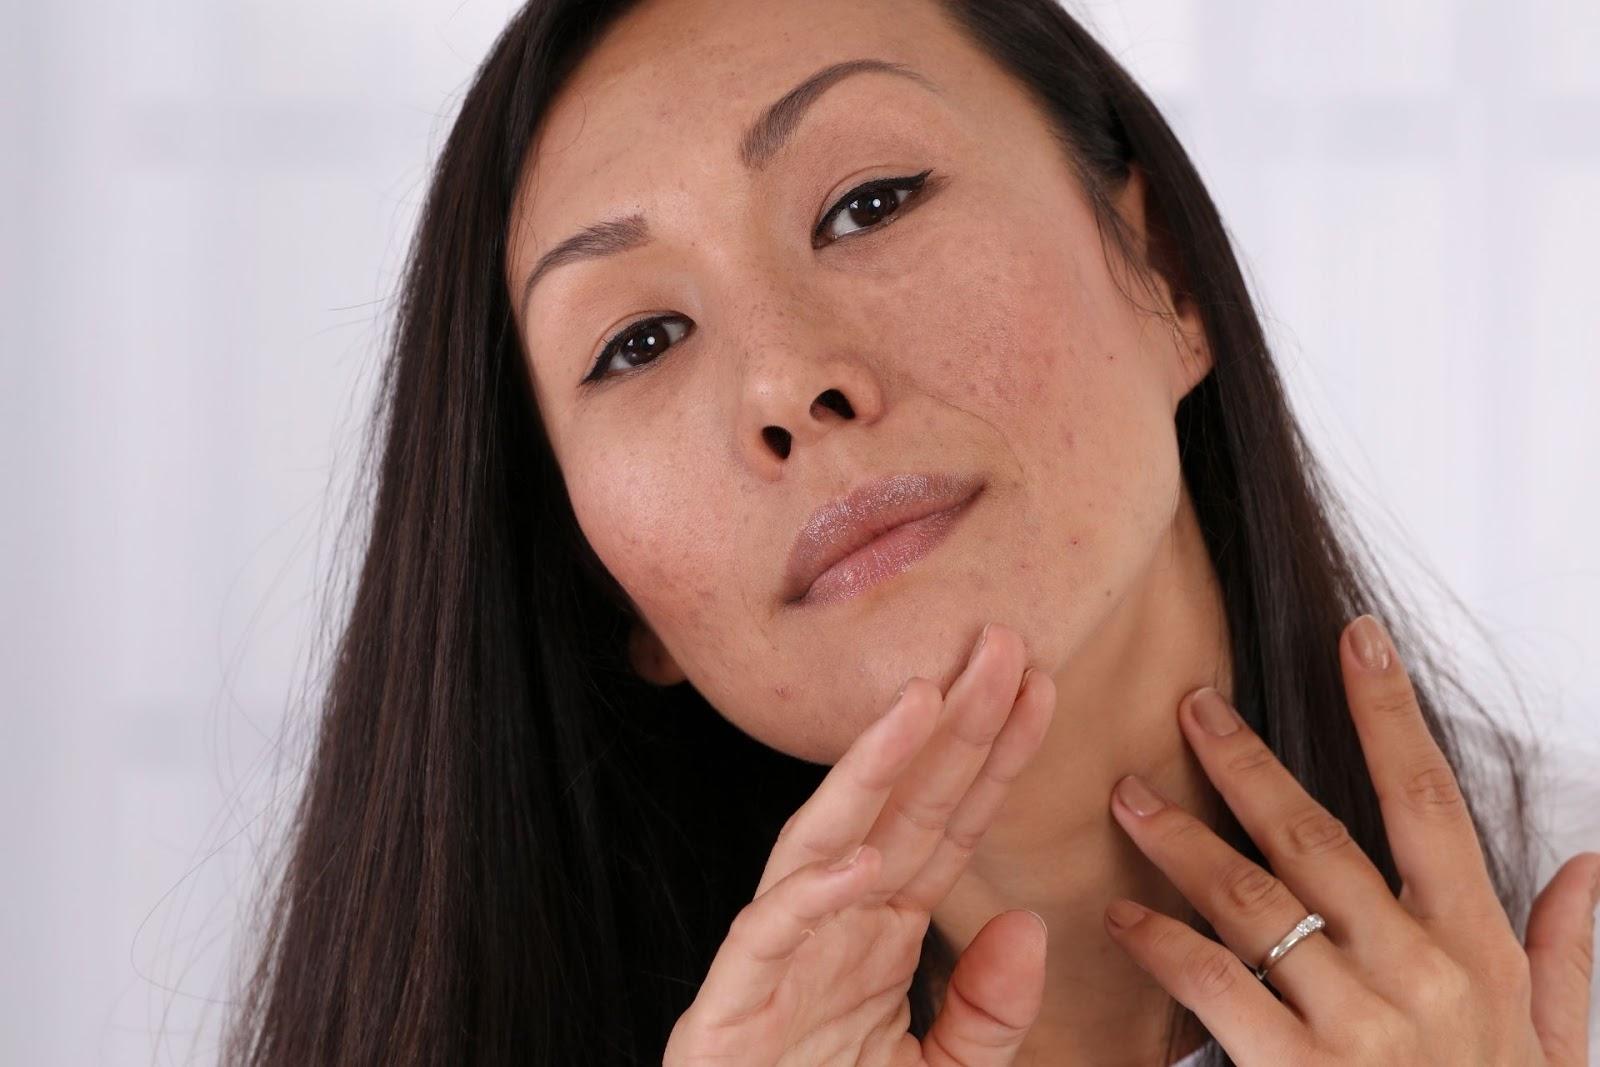 A woman with long dark hair